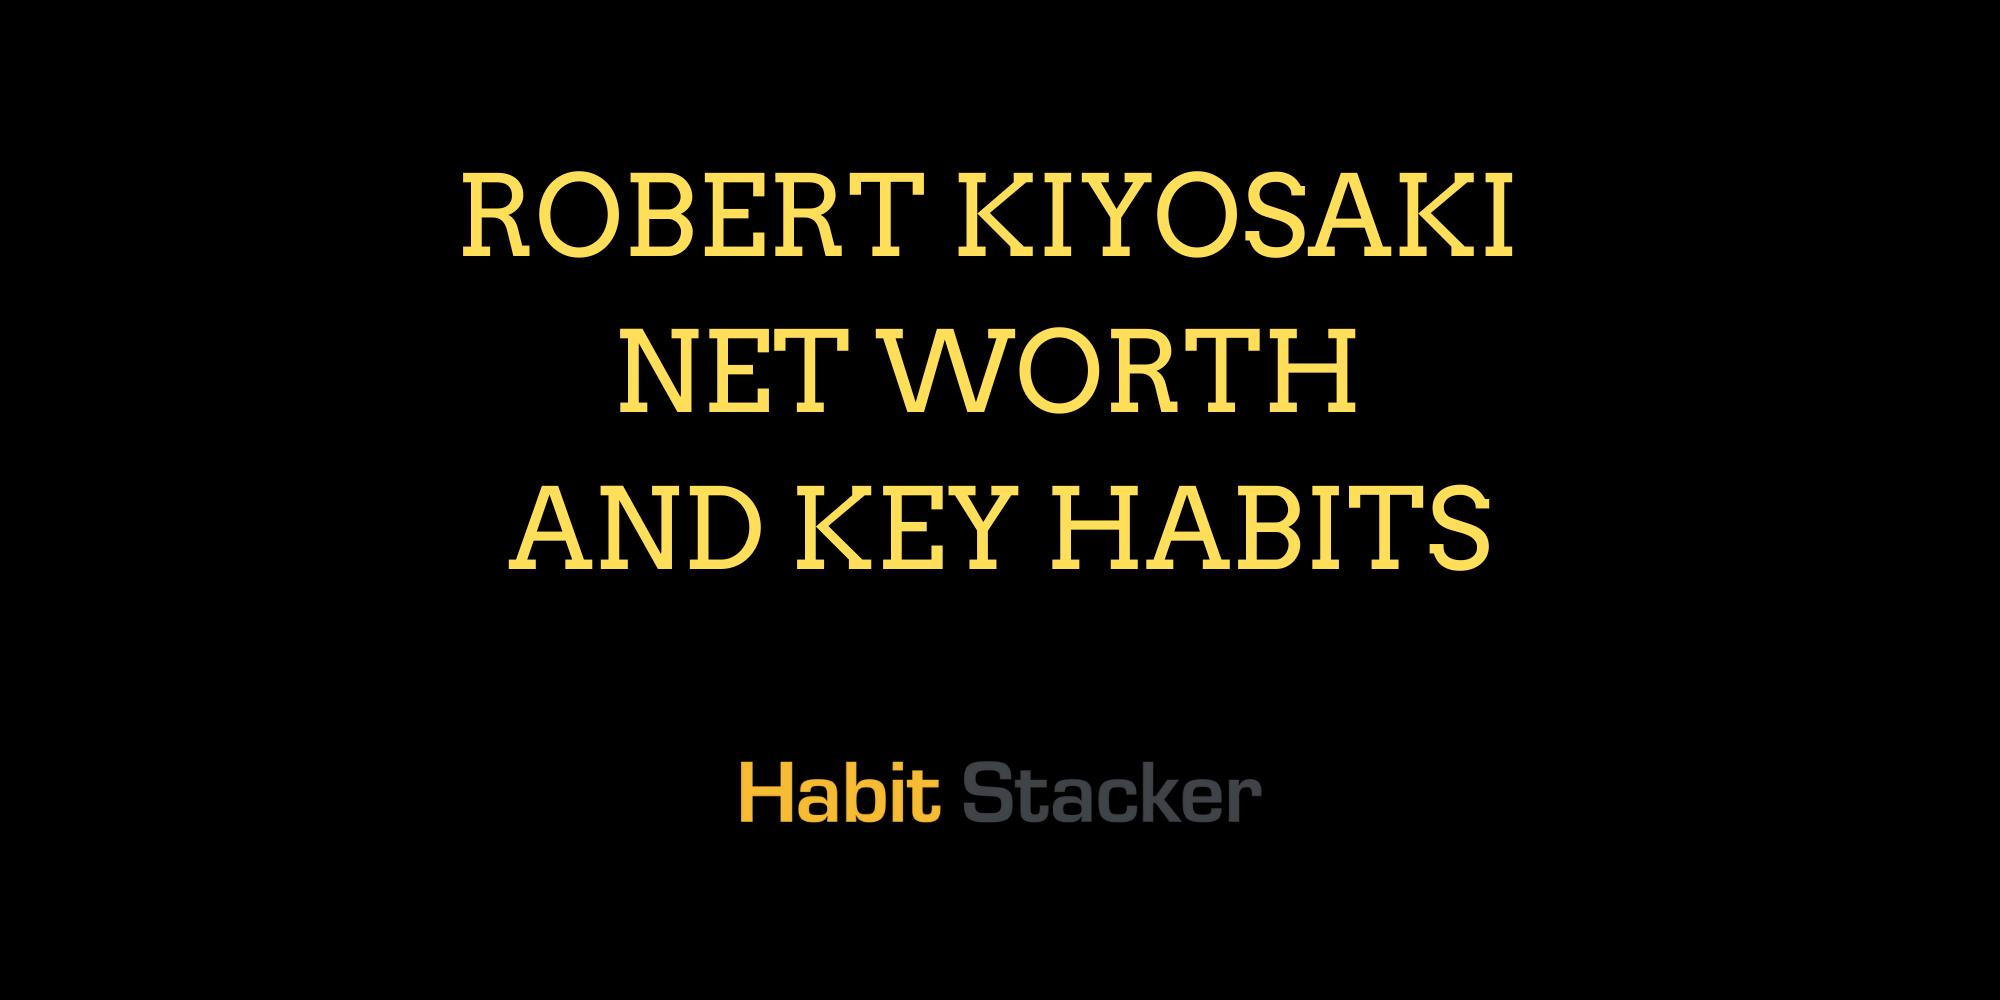 Robert Kiyosaki Net Worth and Key Habits